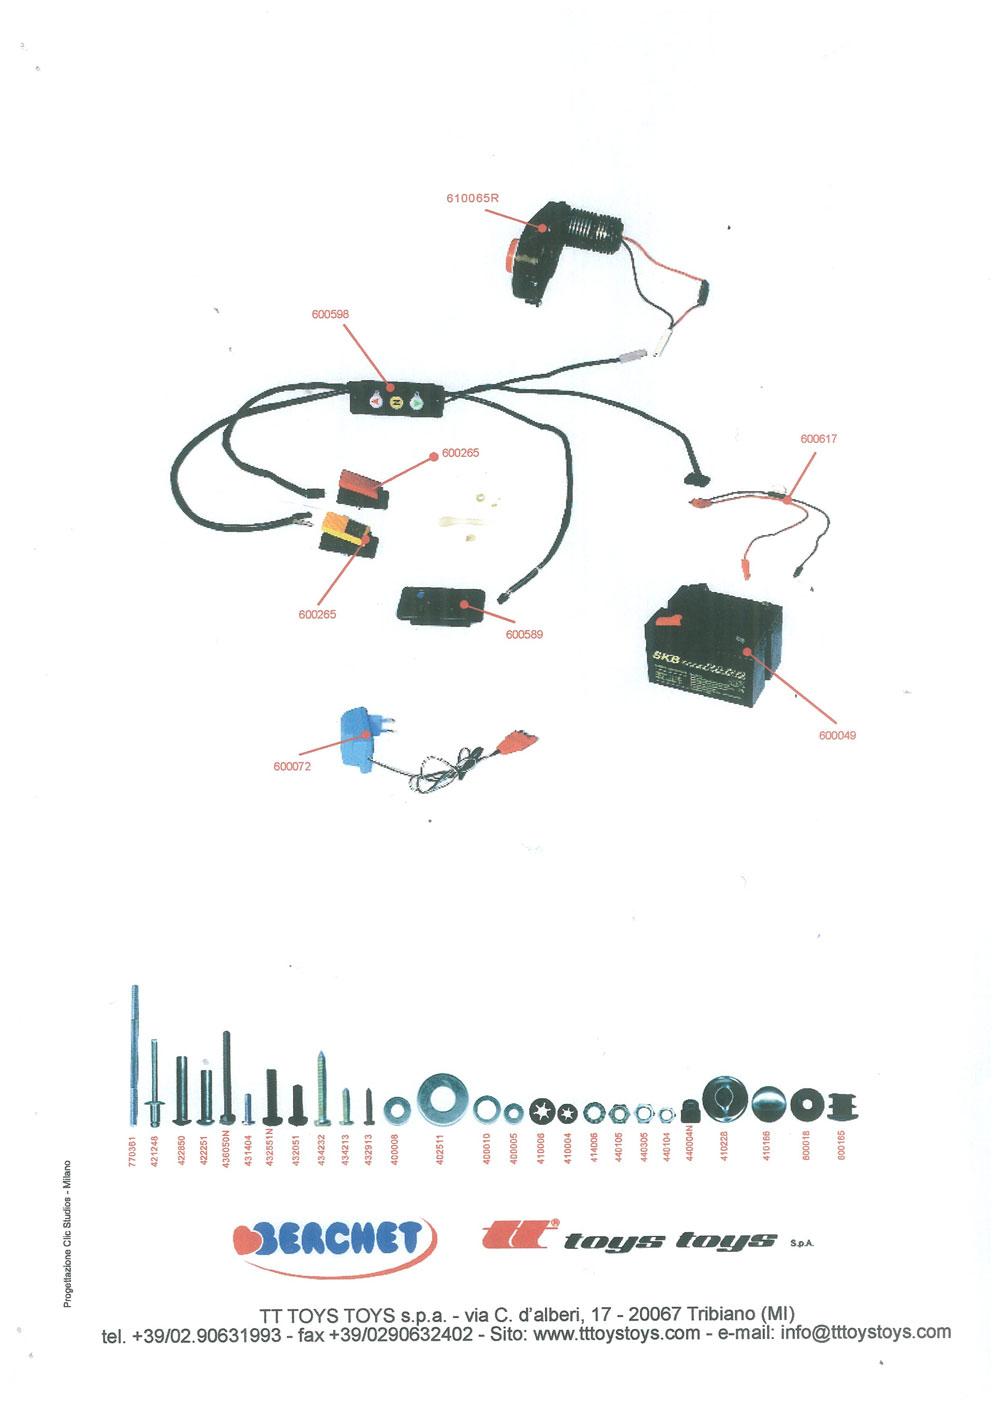 Wiring Diagram For 50cc Pocket Bike | Wiring Diagram on 110cc mini chopper wiring diagram, chinese scooter wiring diagram, x7 pocket bike dimensions, razor mx400 wire diagram, x7 pocket rocket bikes, x7 pocket bike parts, bike rear axle assembly diagram, vanguard engine wiring diagram, x7 pocket bike wheels, pocket bike engine diagram, 49cc parts diagram, x7 pocket bike frame, apc mini chopper wiring diagram, x7 super pocket bike,